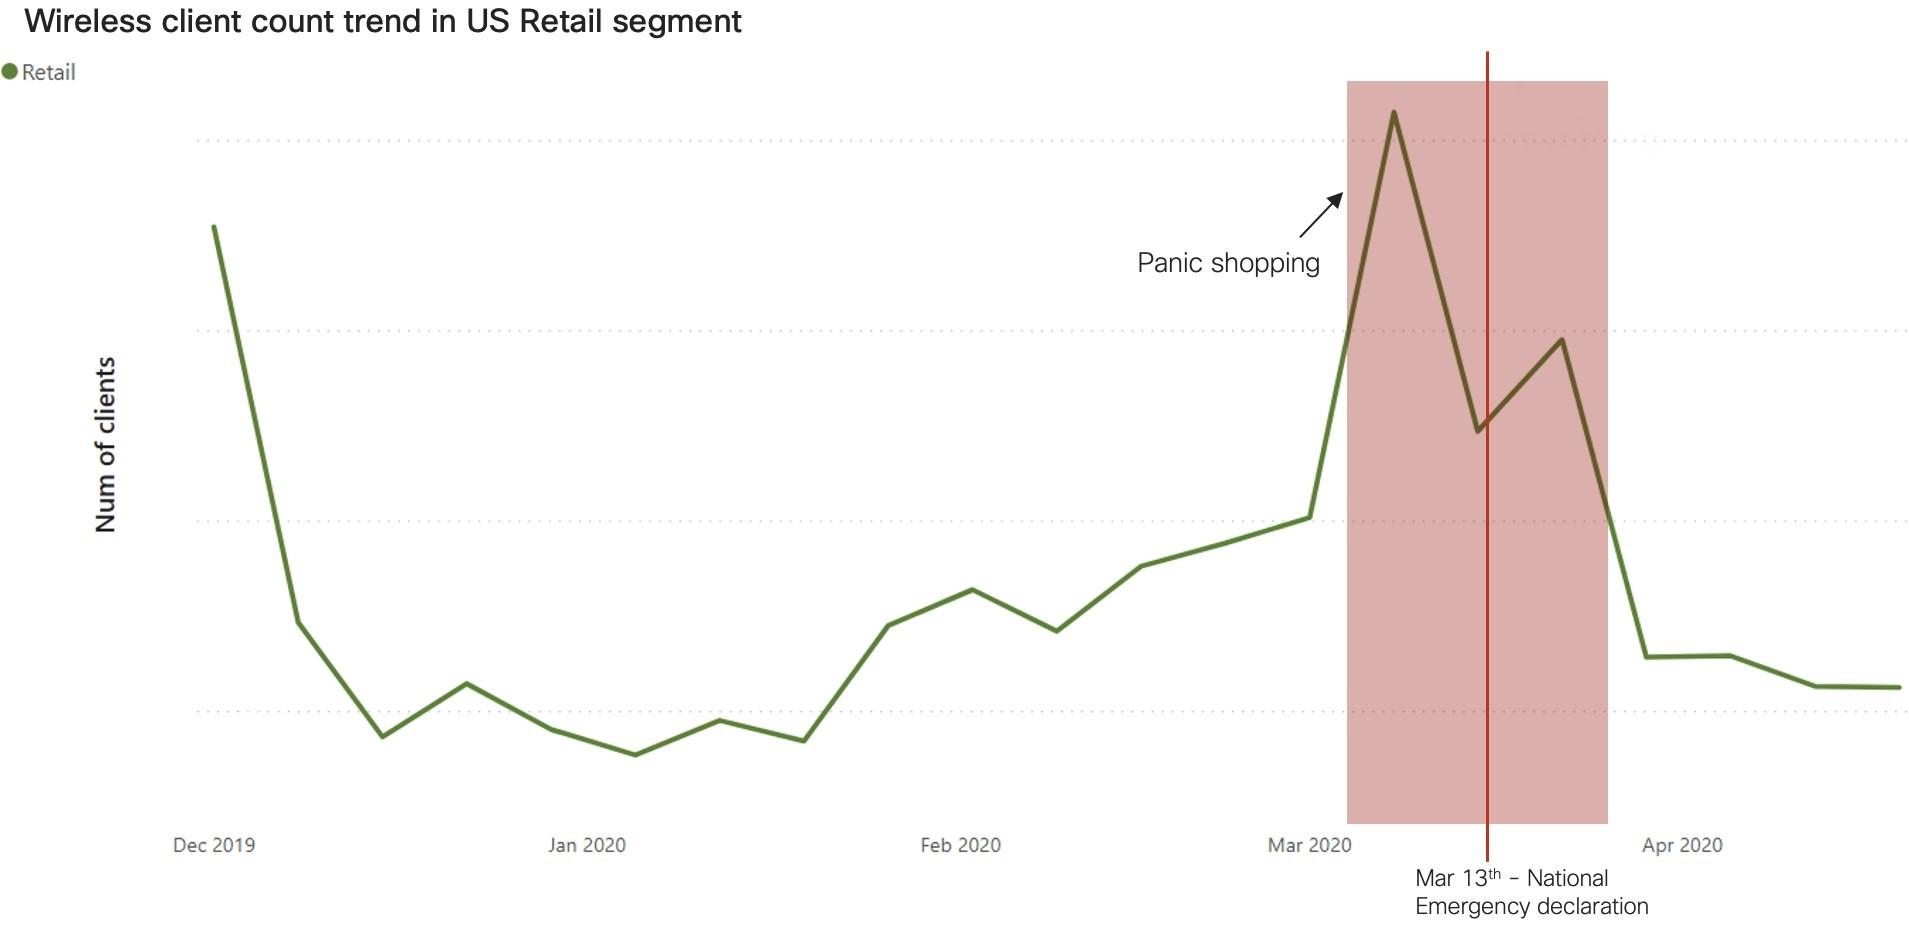 Wireless client count trend in US Retail segment